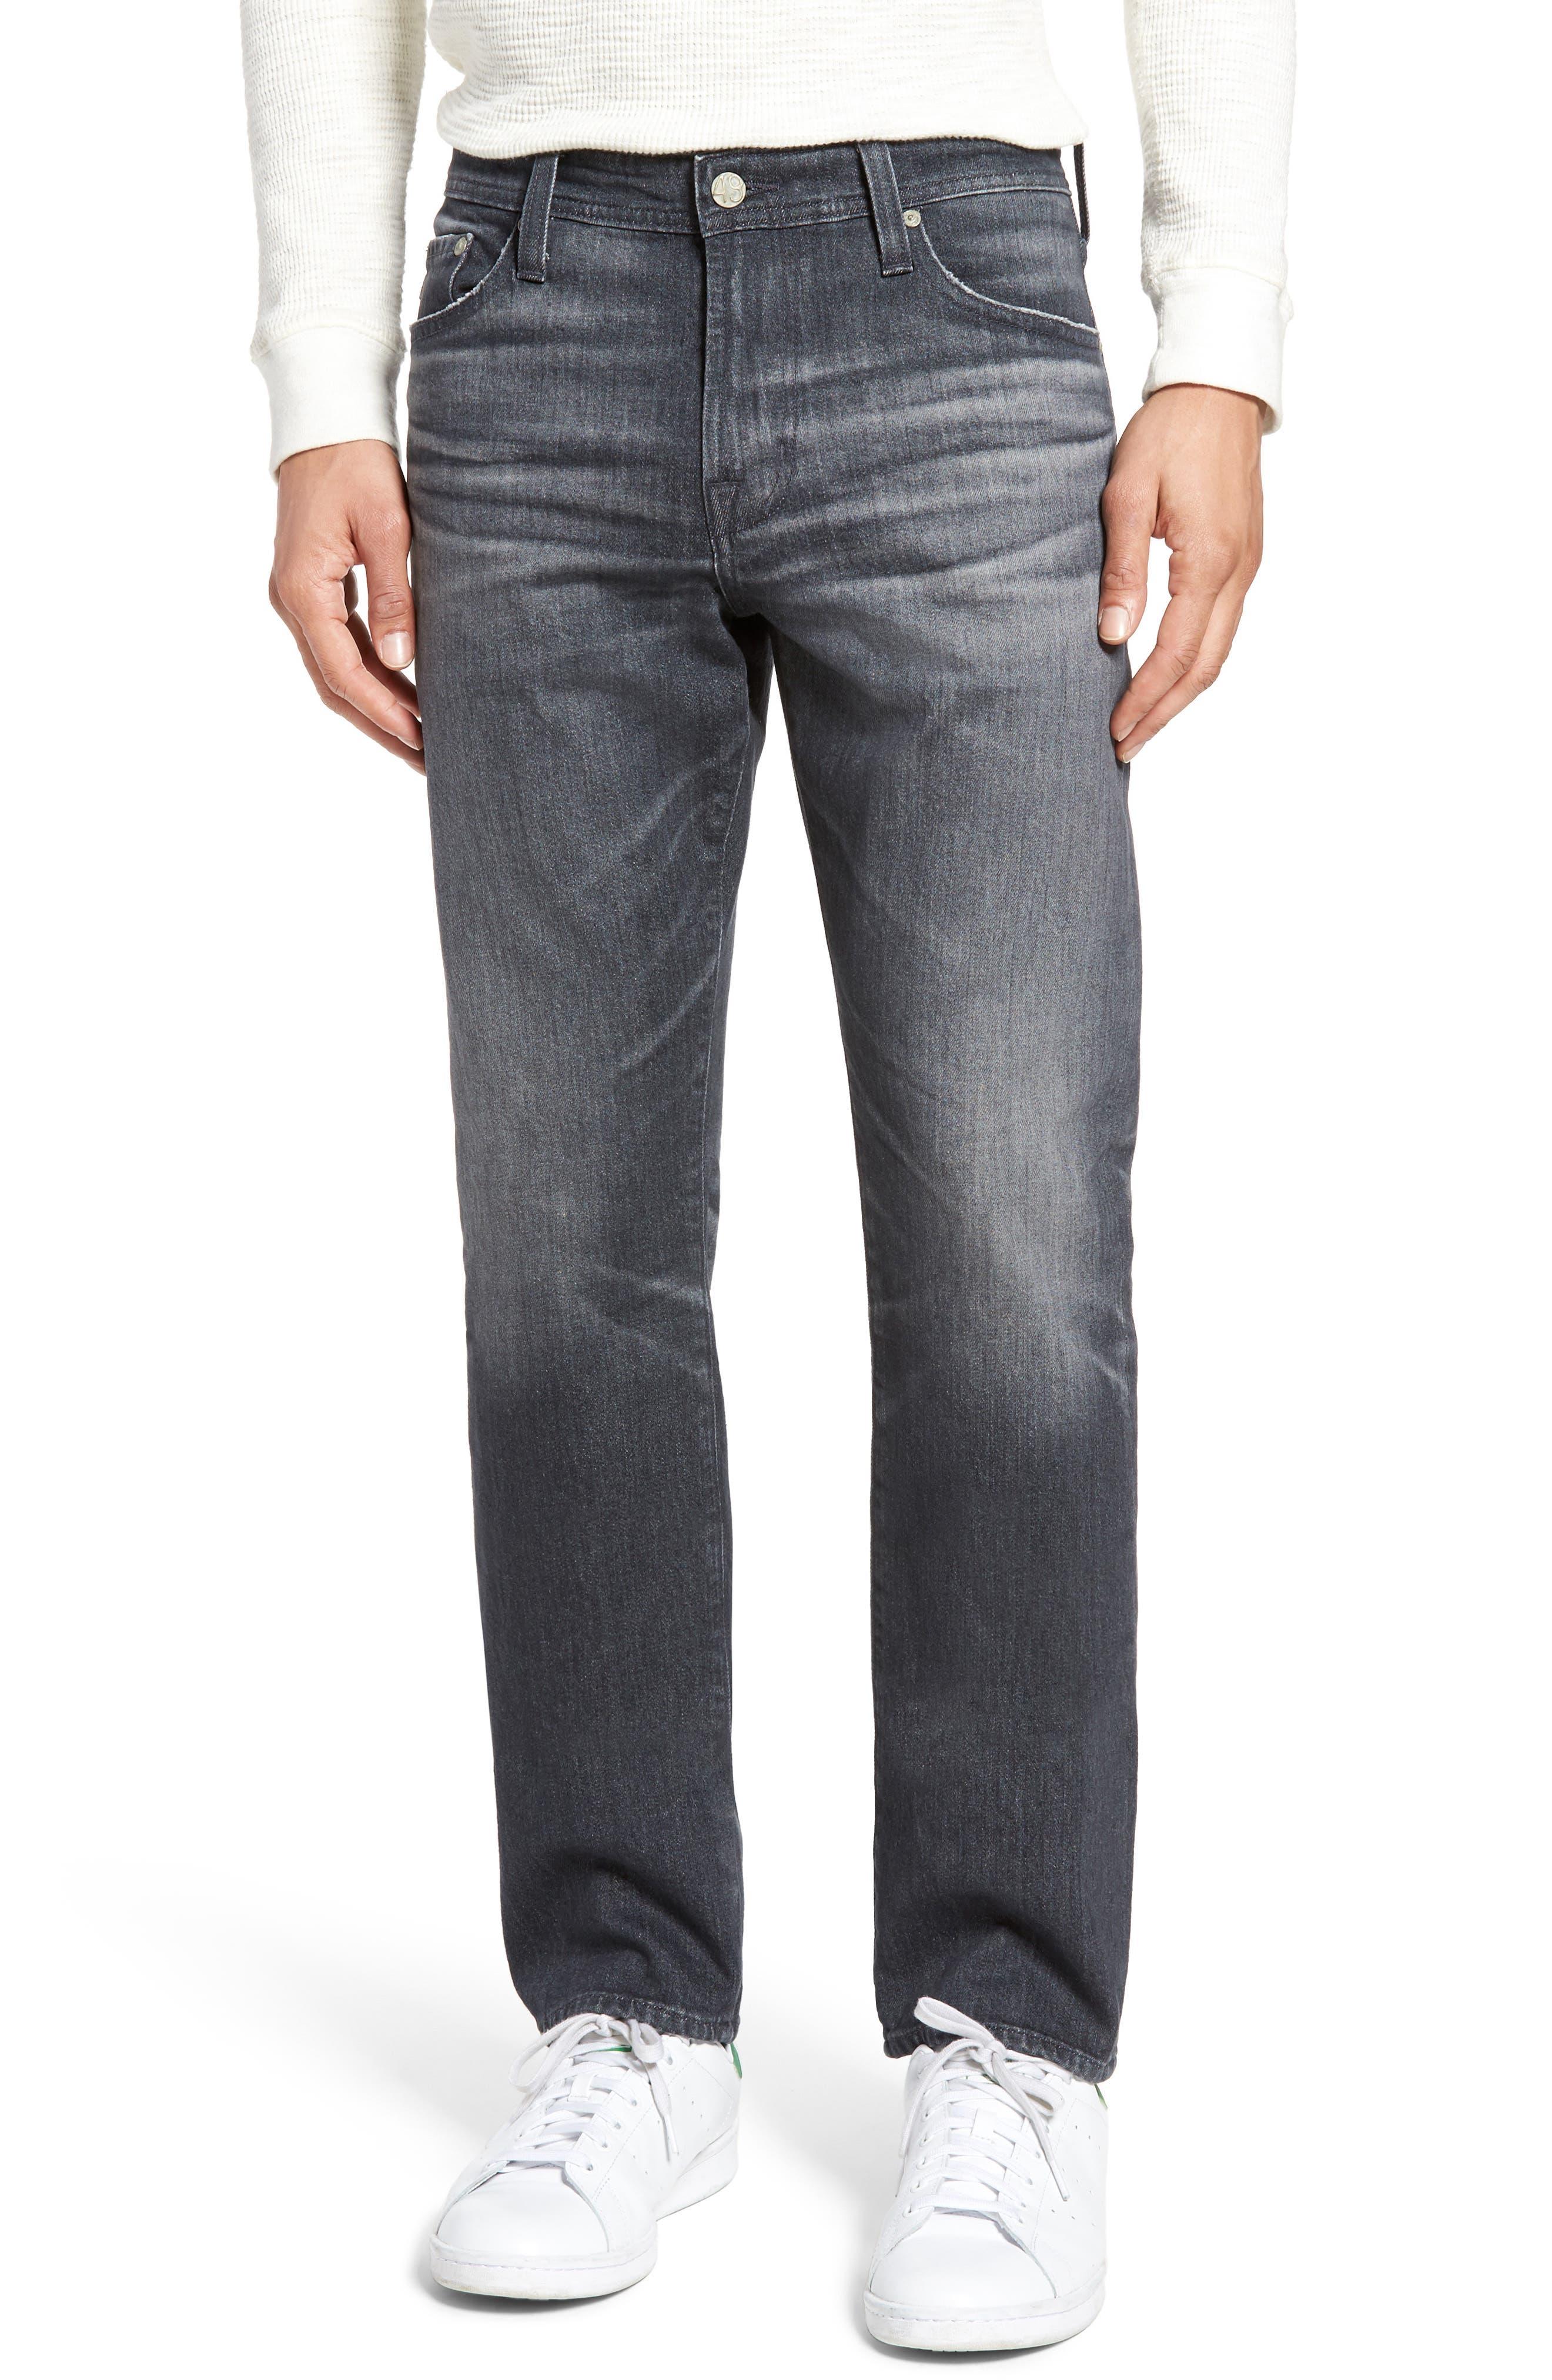 Alternate Image 1 Selected - AG Everett Slim Straight Leg Jeans (5 Year Idle)